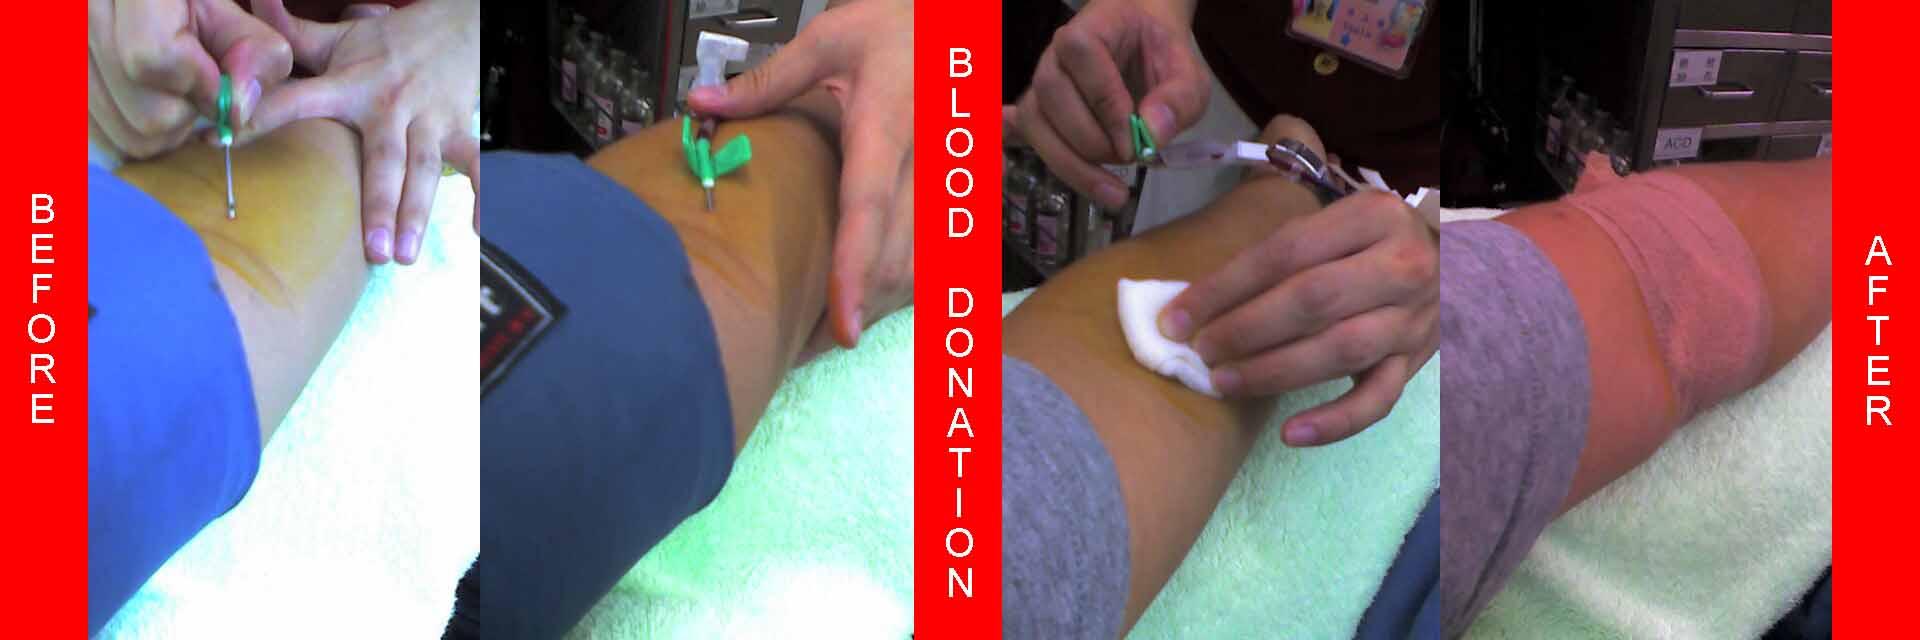 File Blood Donation Needle Jpg Wikimedia Commons